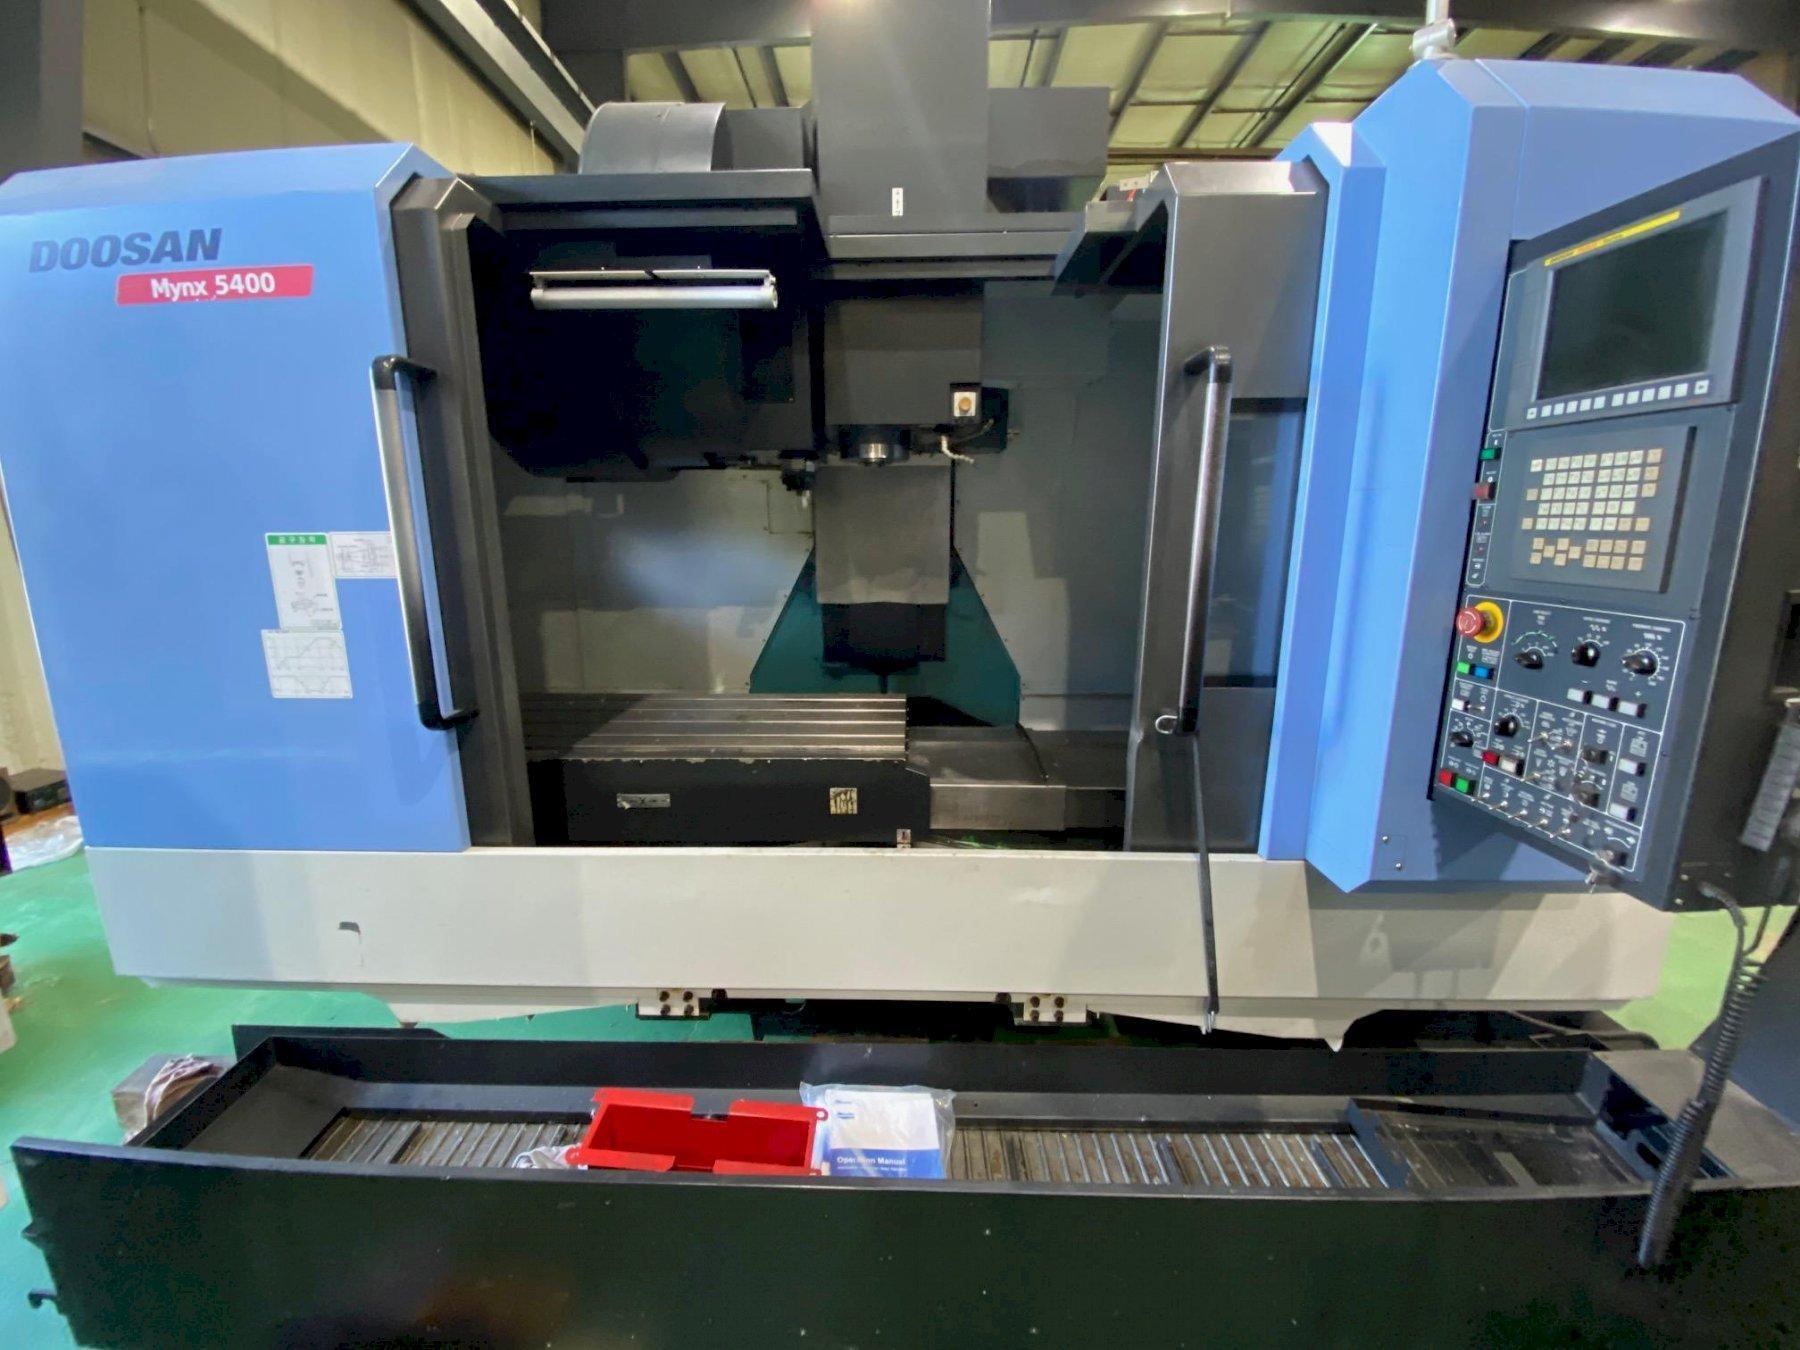 2014 Doosan Mynx 5400 - Vertical Machining Center